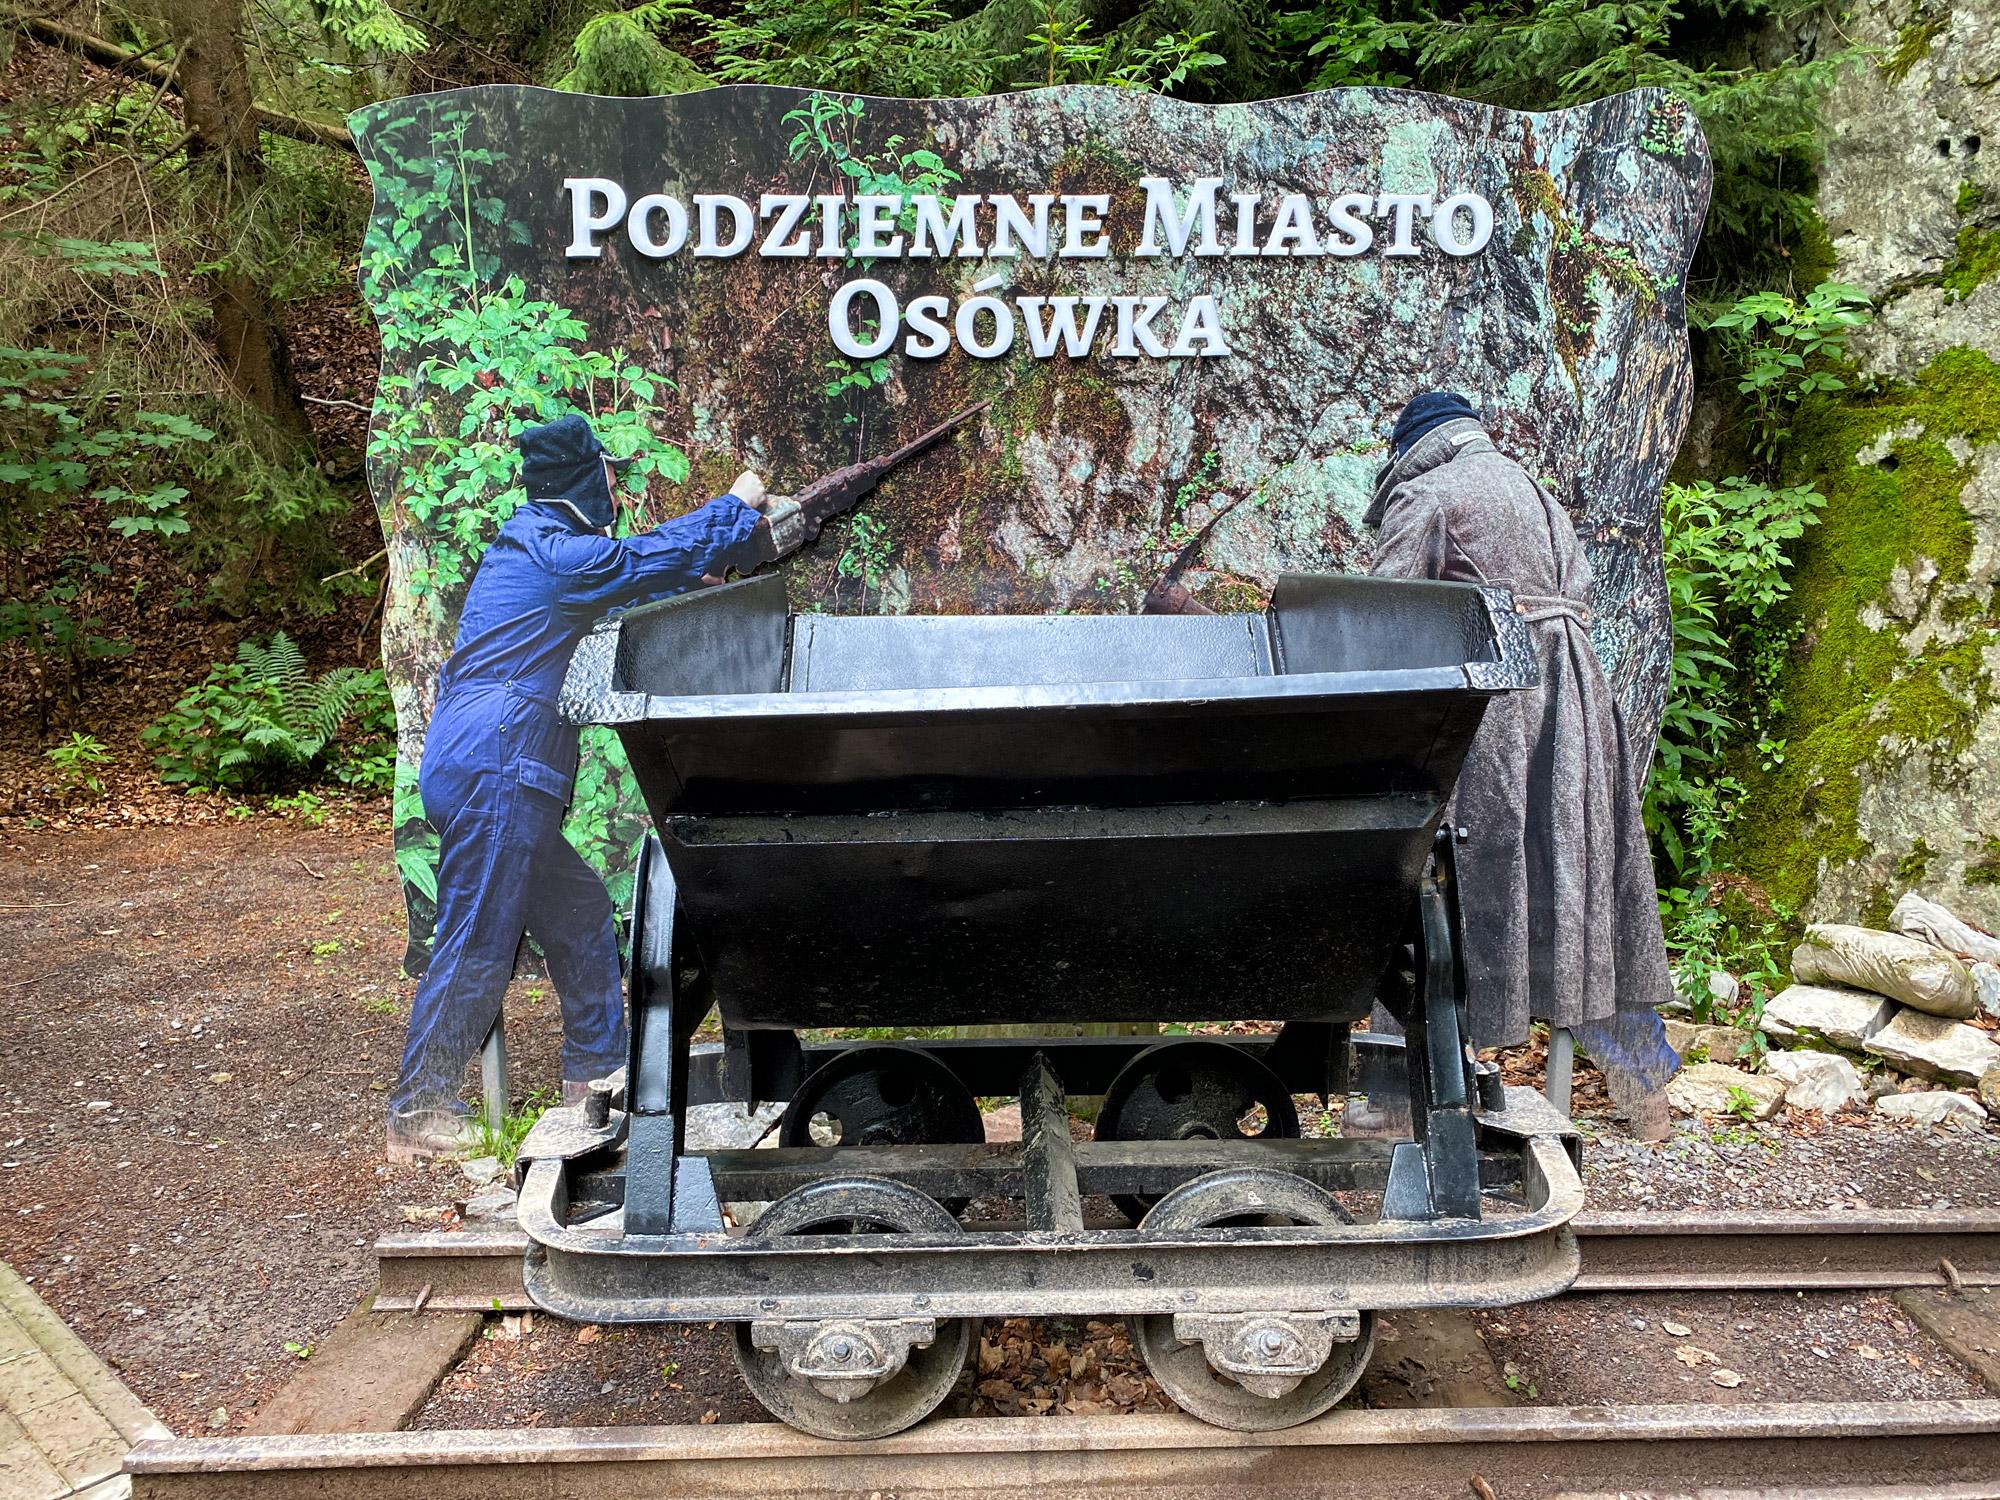 De Ondergrondse stad Osówka - Polen